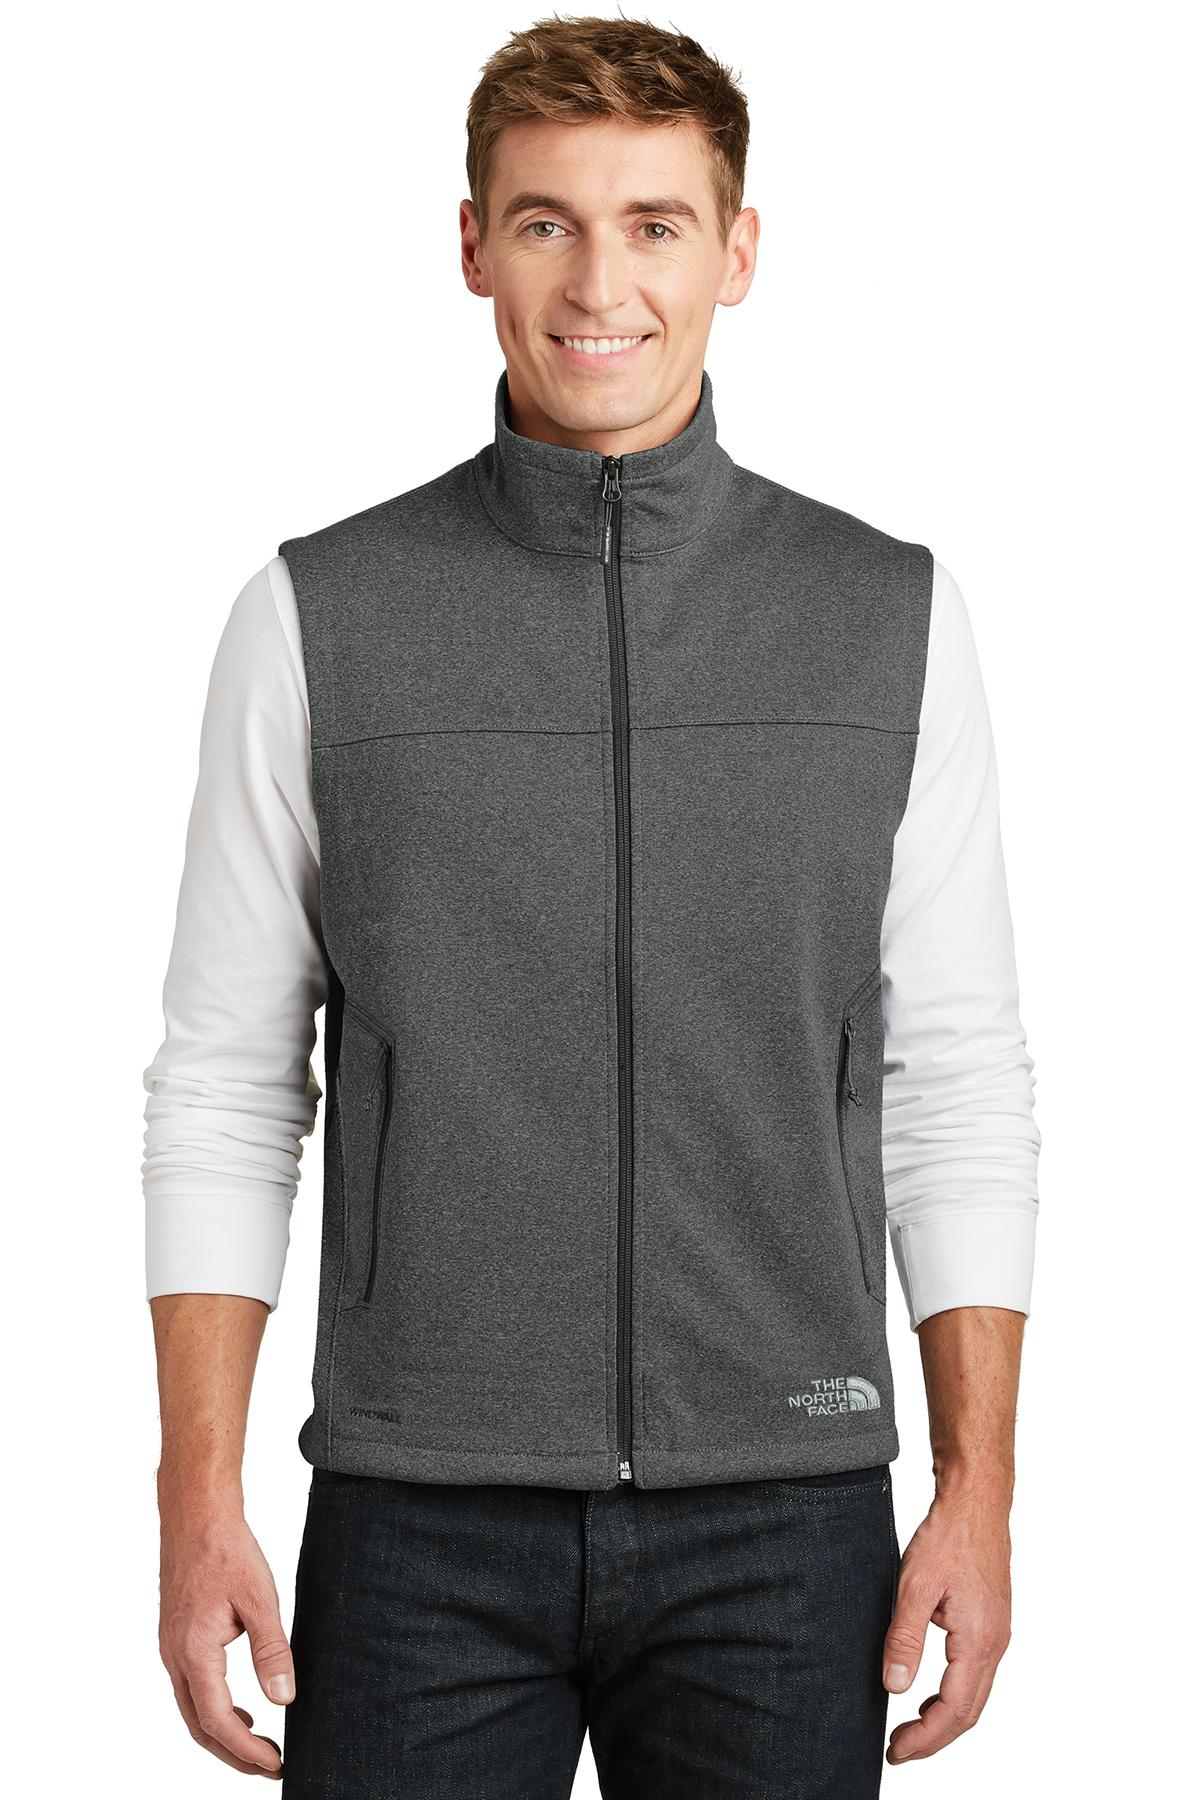 The North Face® NF0A3LGZ - Men's Ridgeline Soft Shell Vest